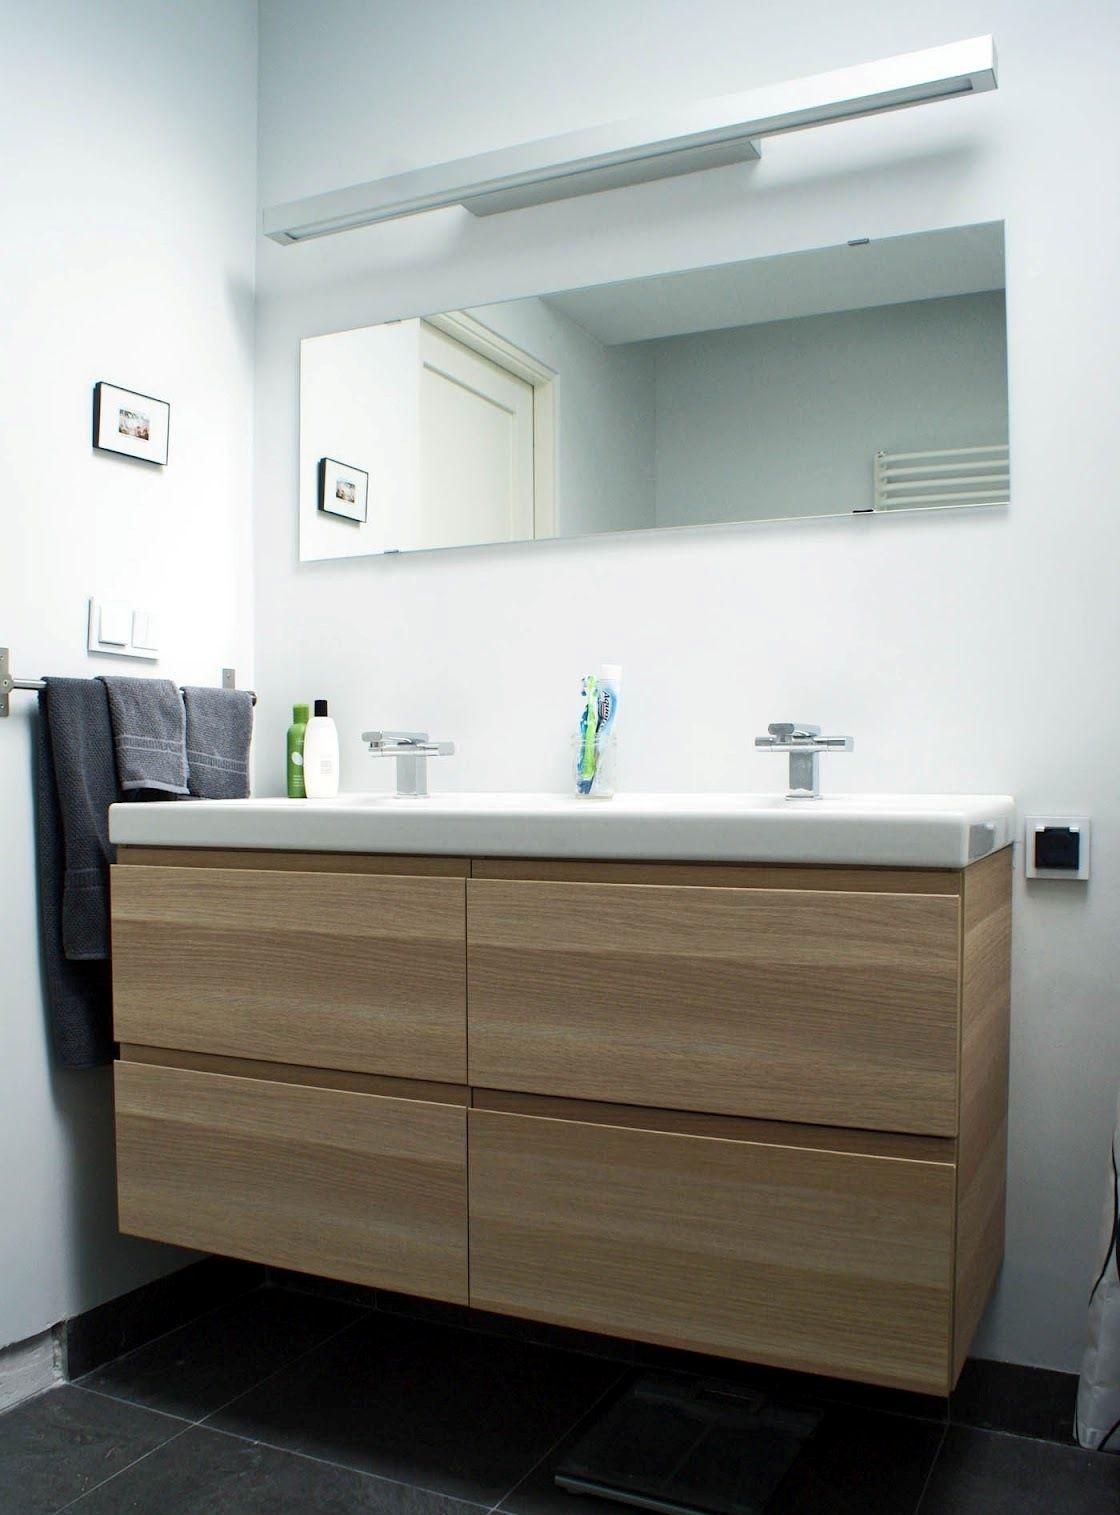 Furniture & Home Furnishings IKEA Green kitchen